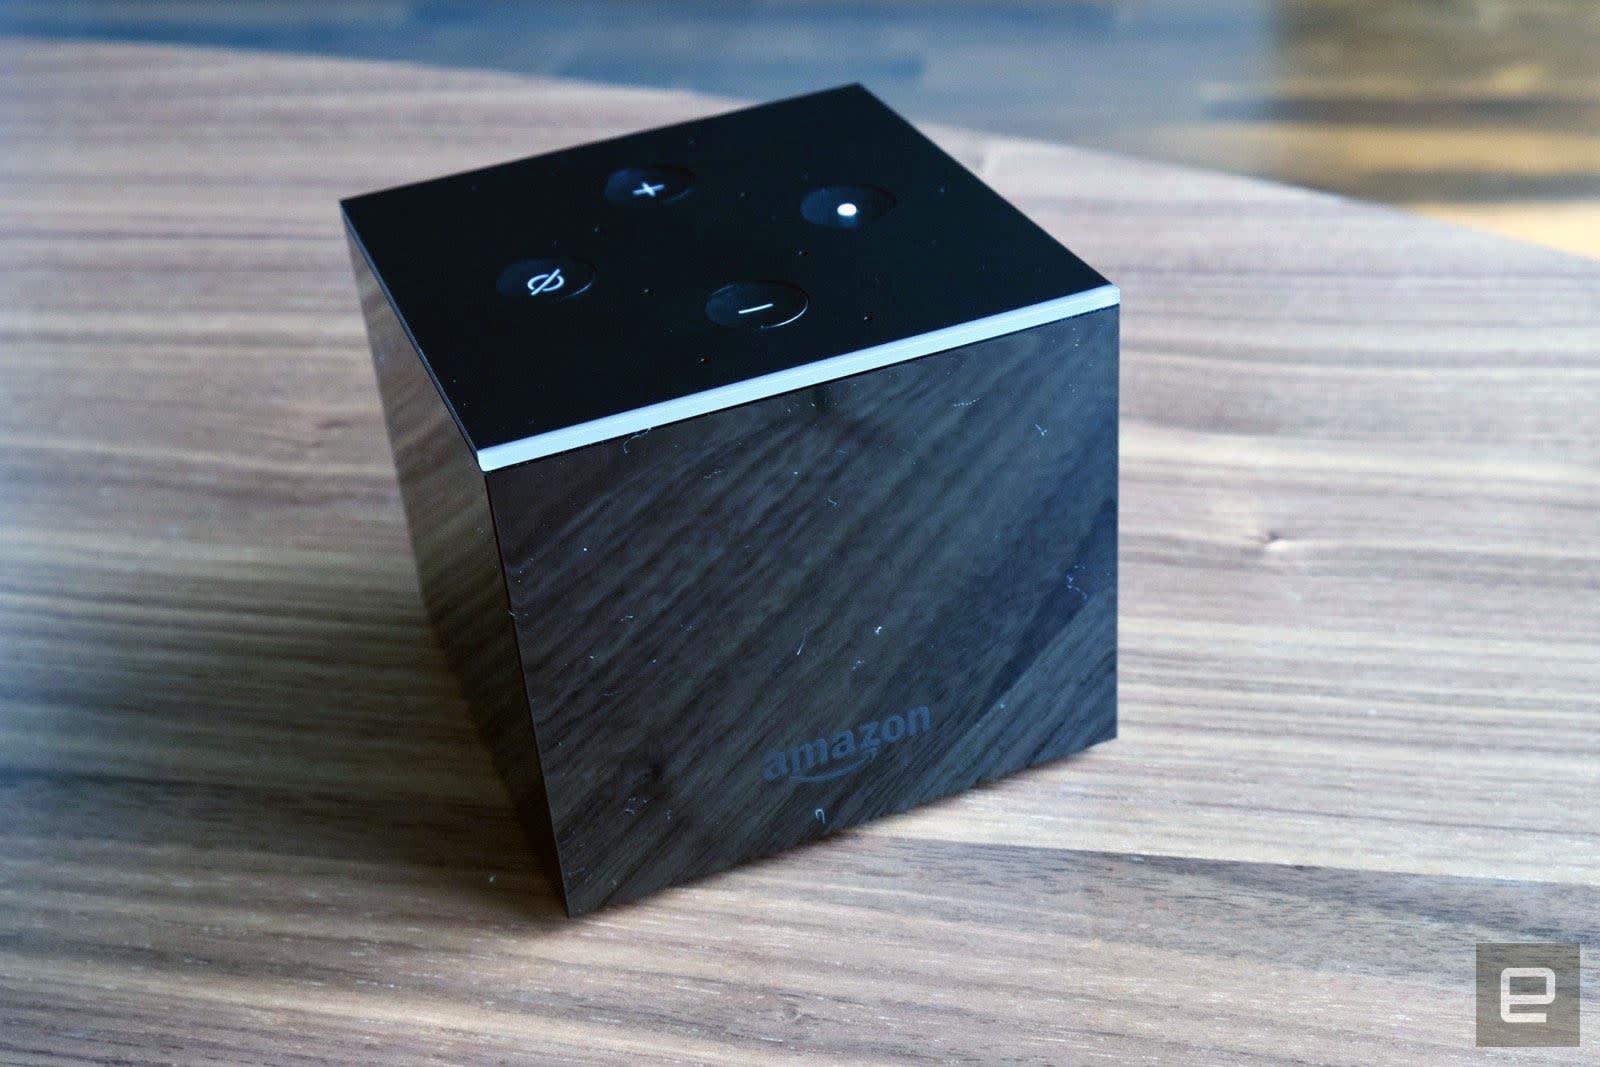 Alexa voice control arrives for select DirecTV set-top boxes